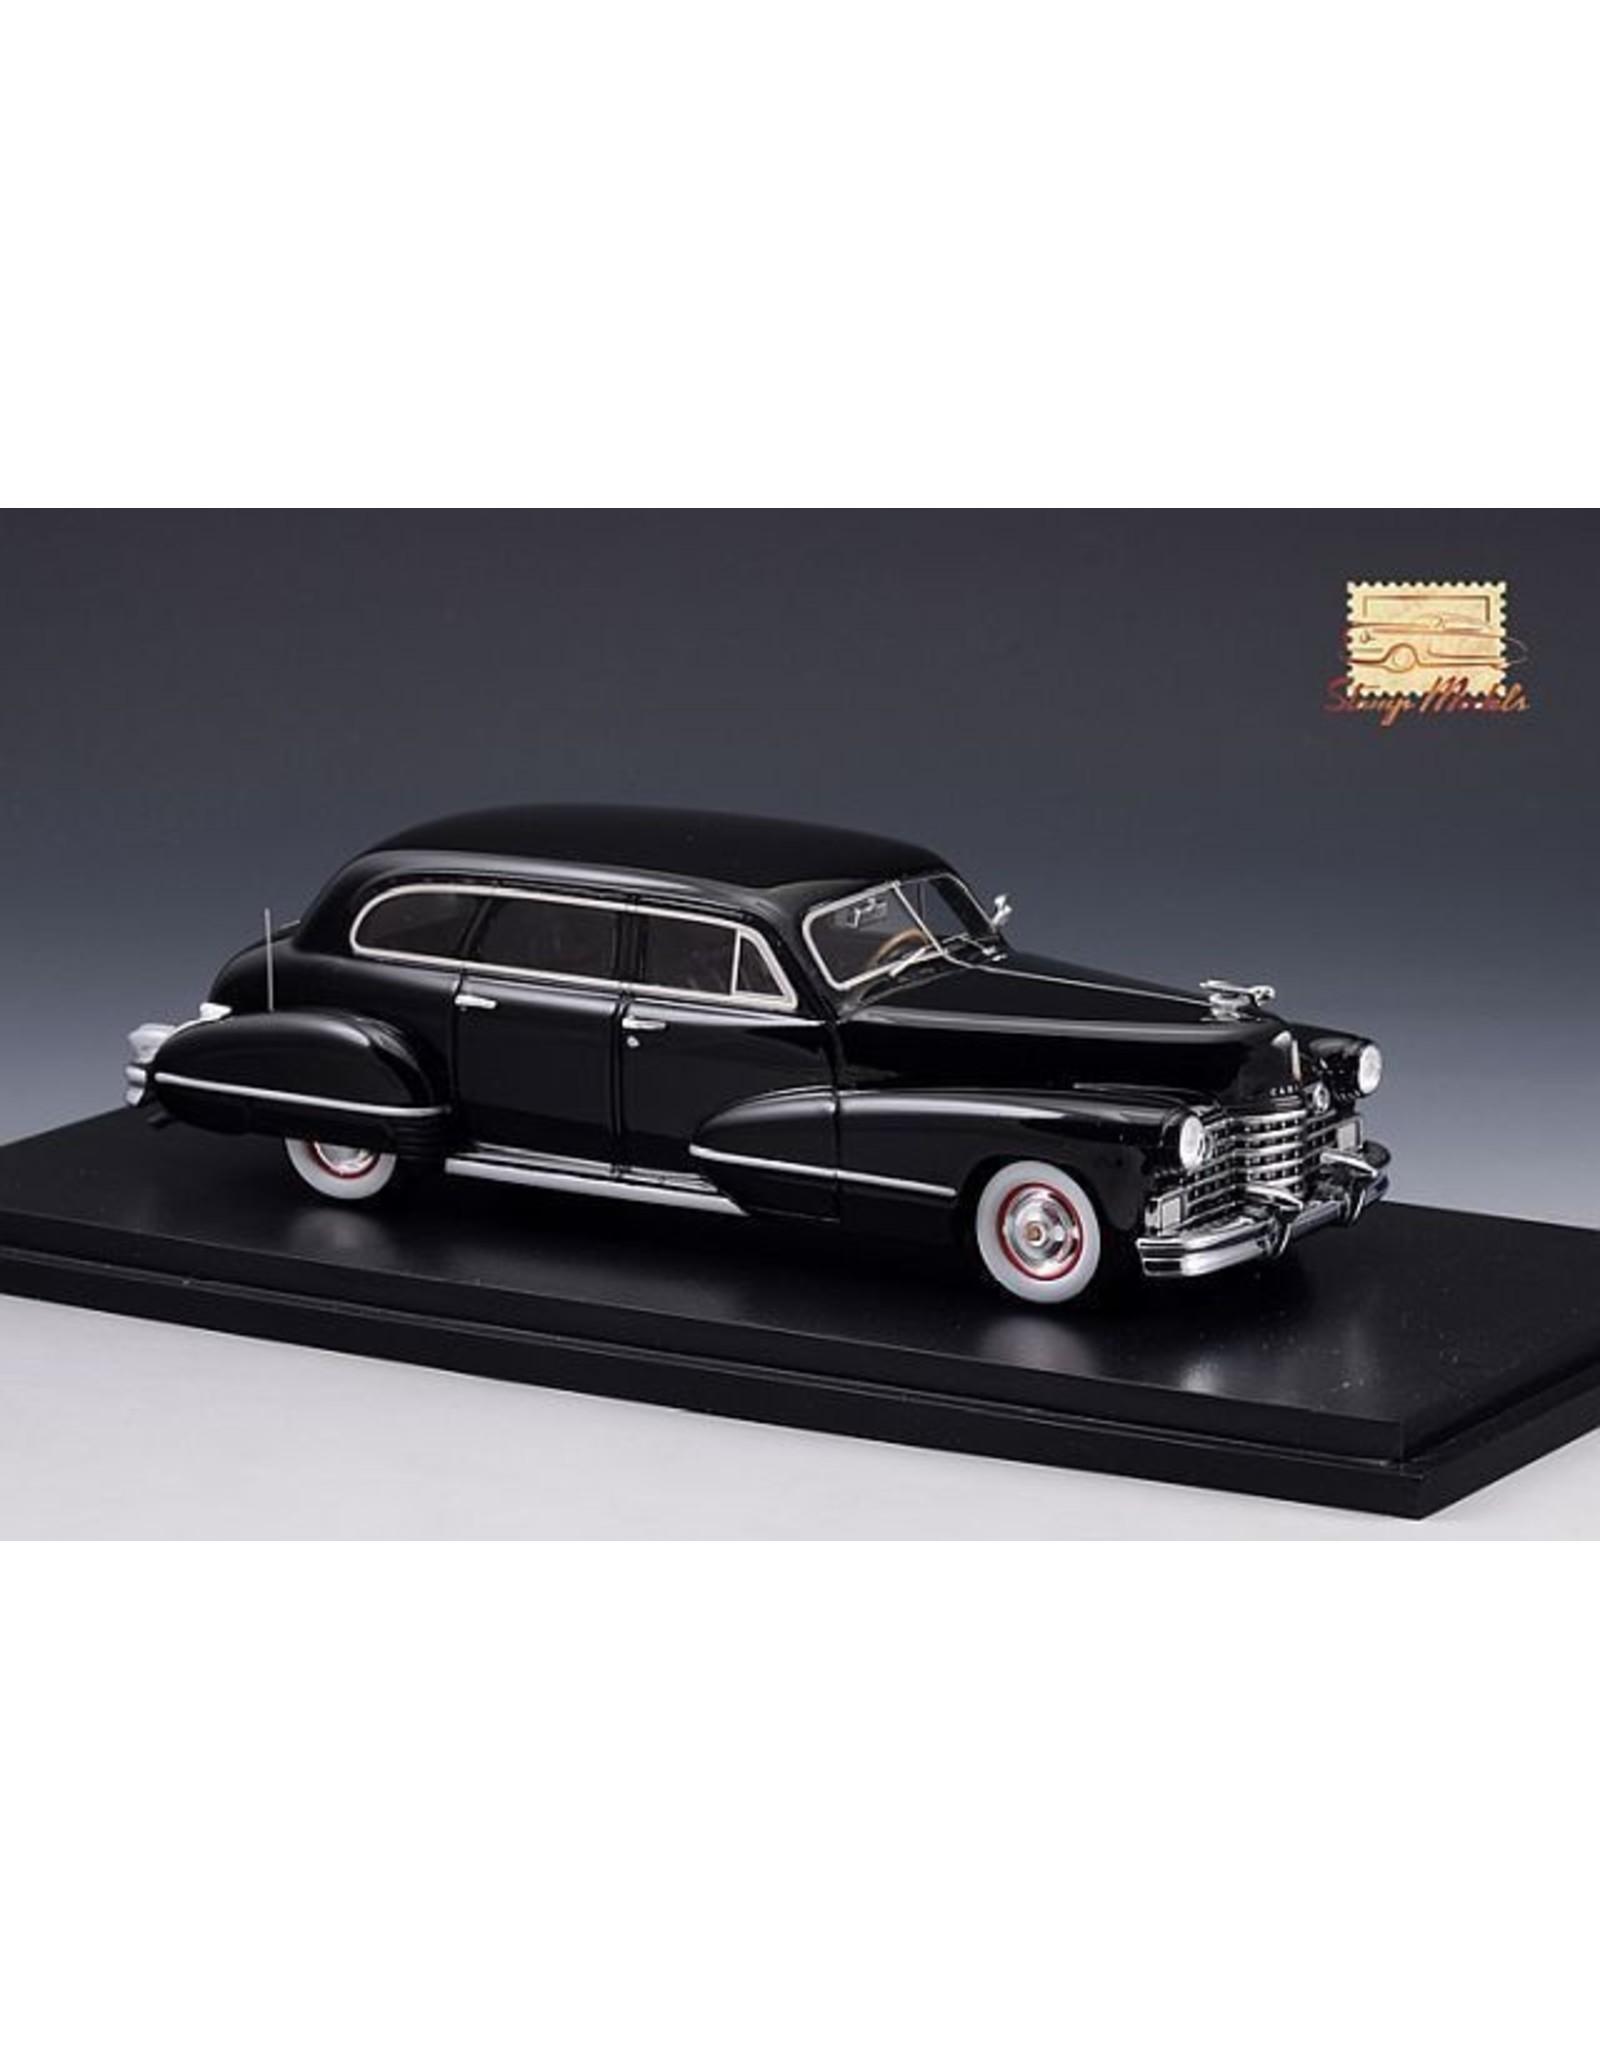 Cadillac(General Motors) Cadillac Series 67(1942)black.